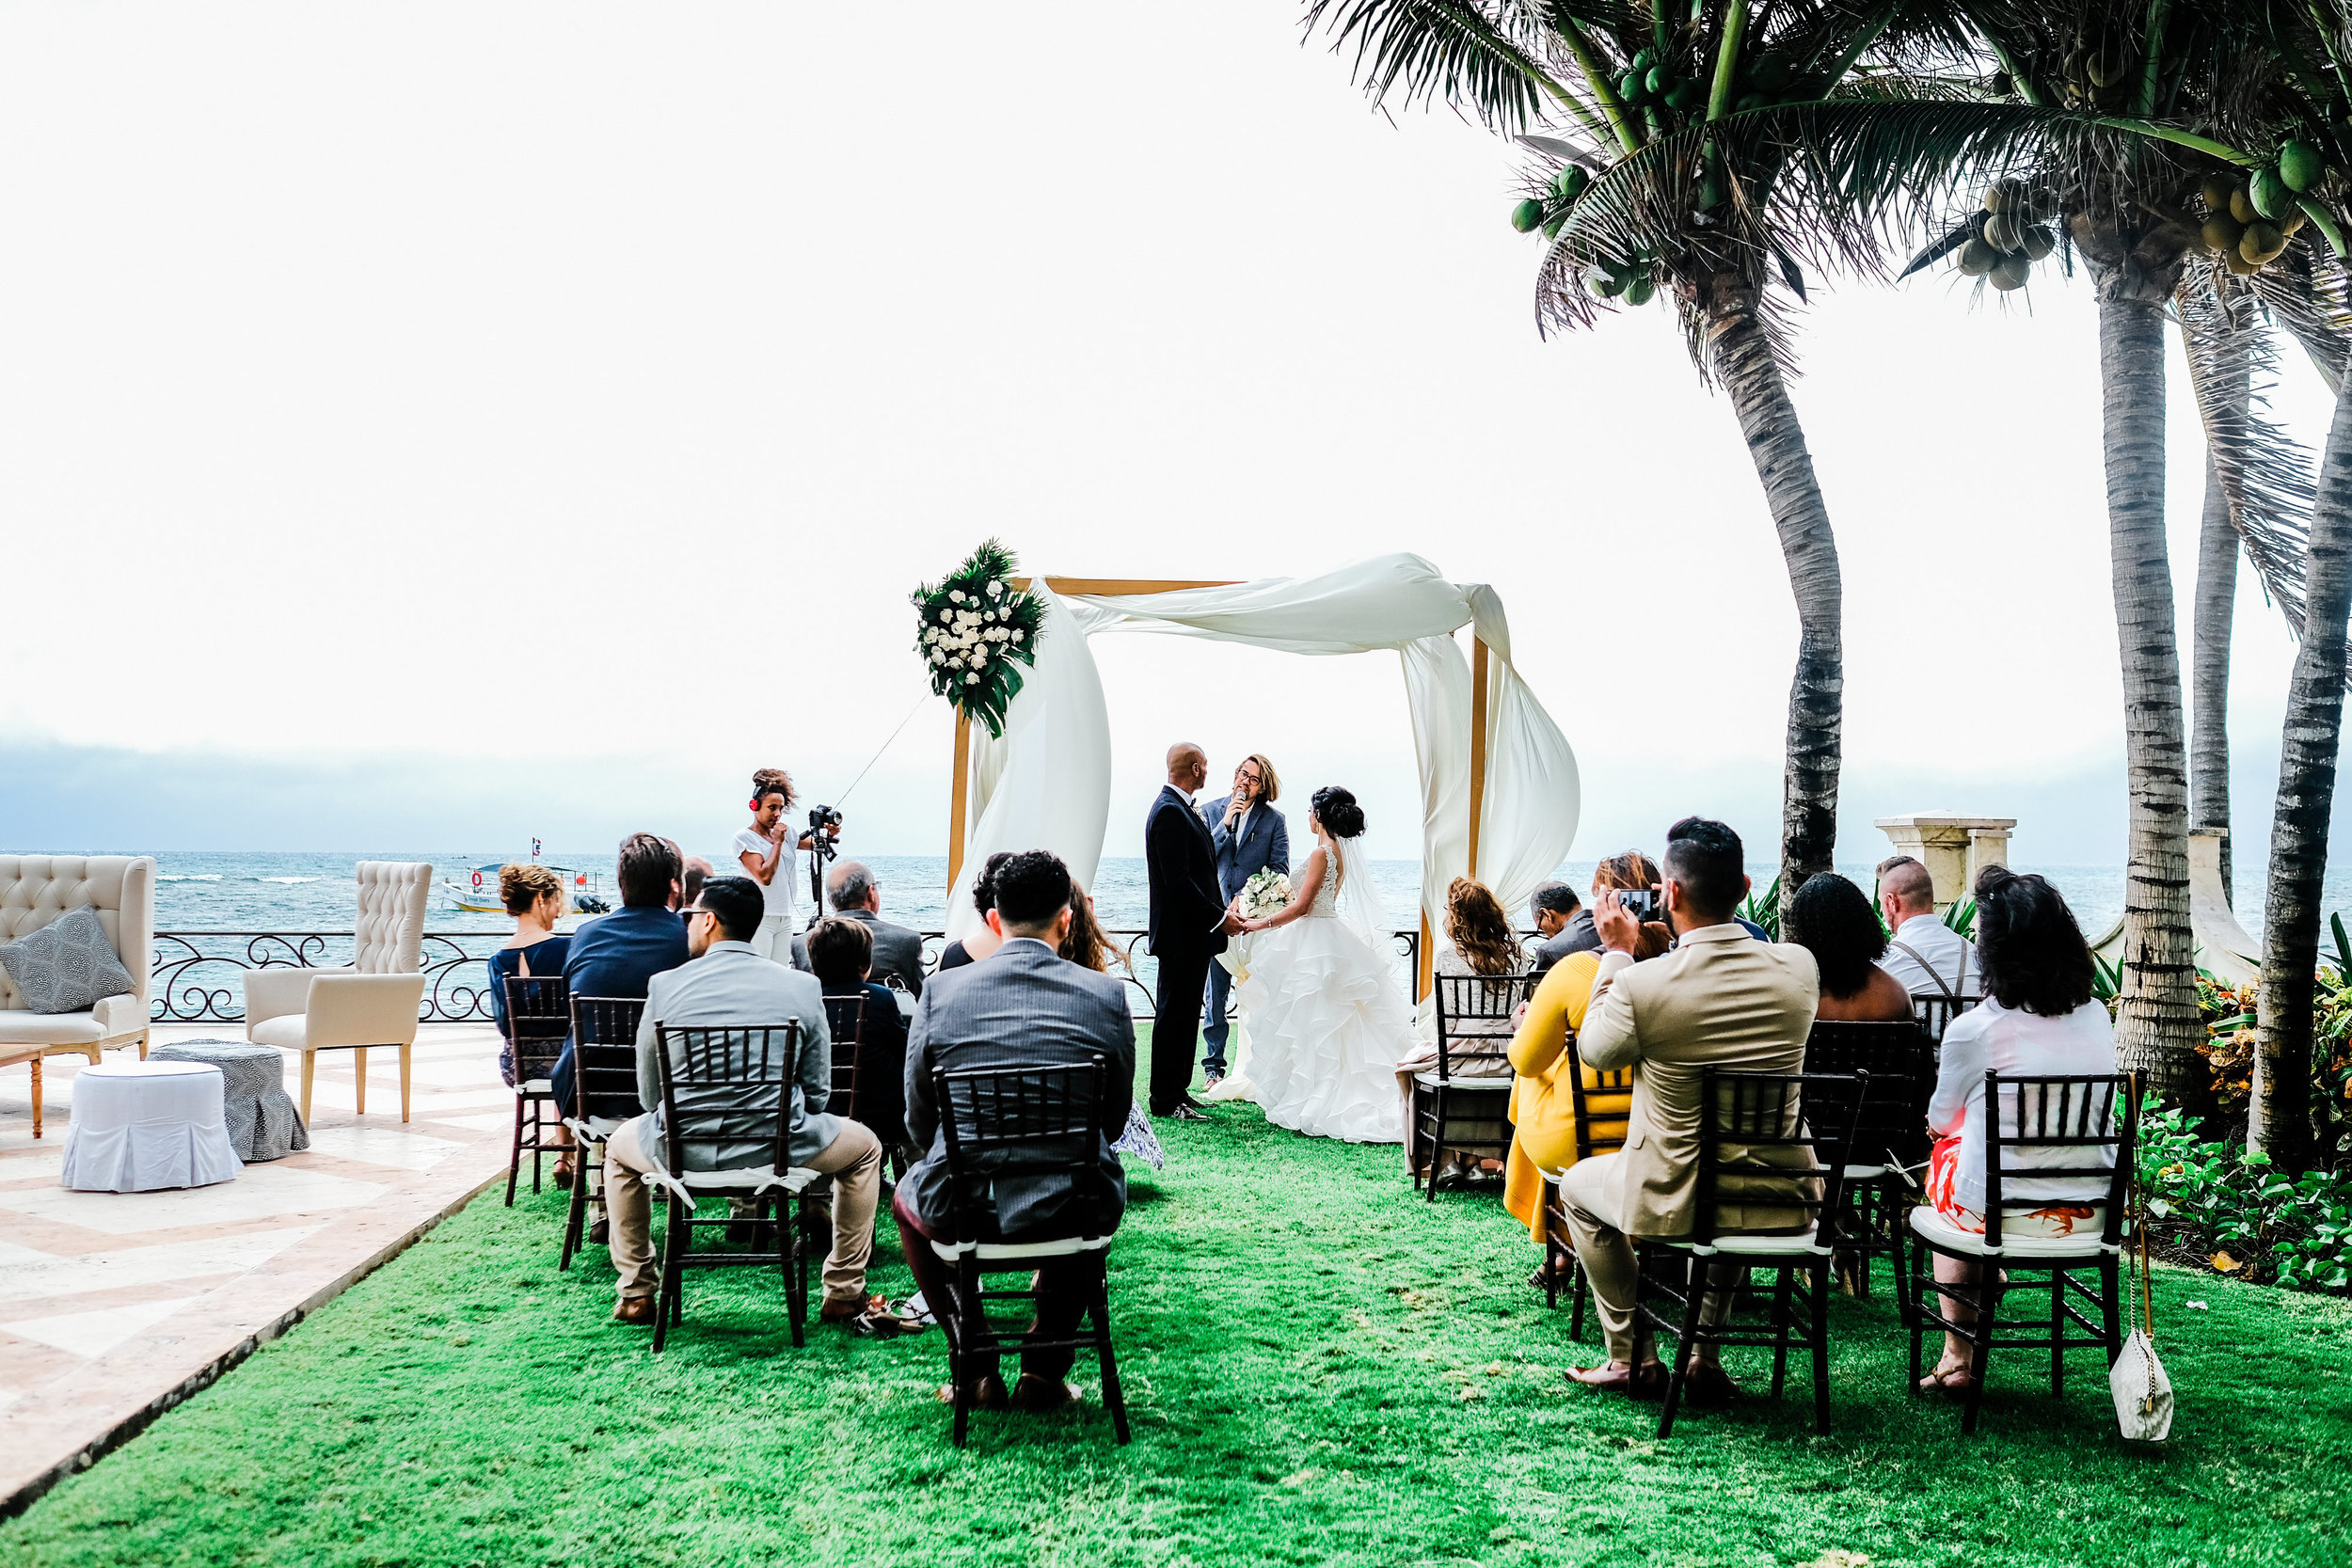 mexico_destination_wedding_villa_la_joya_cancun_65.jpg